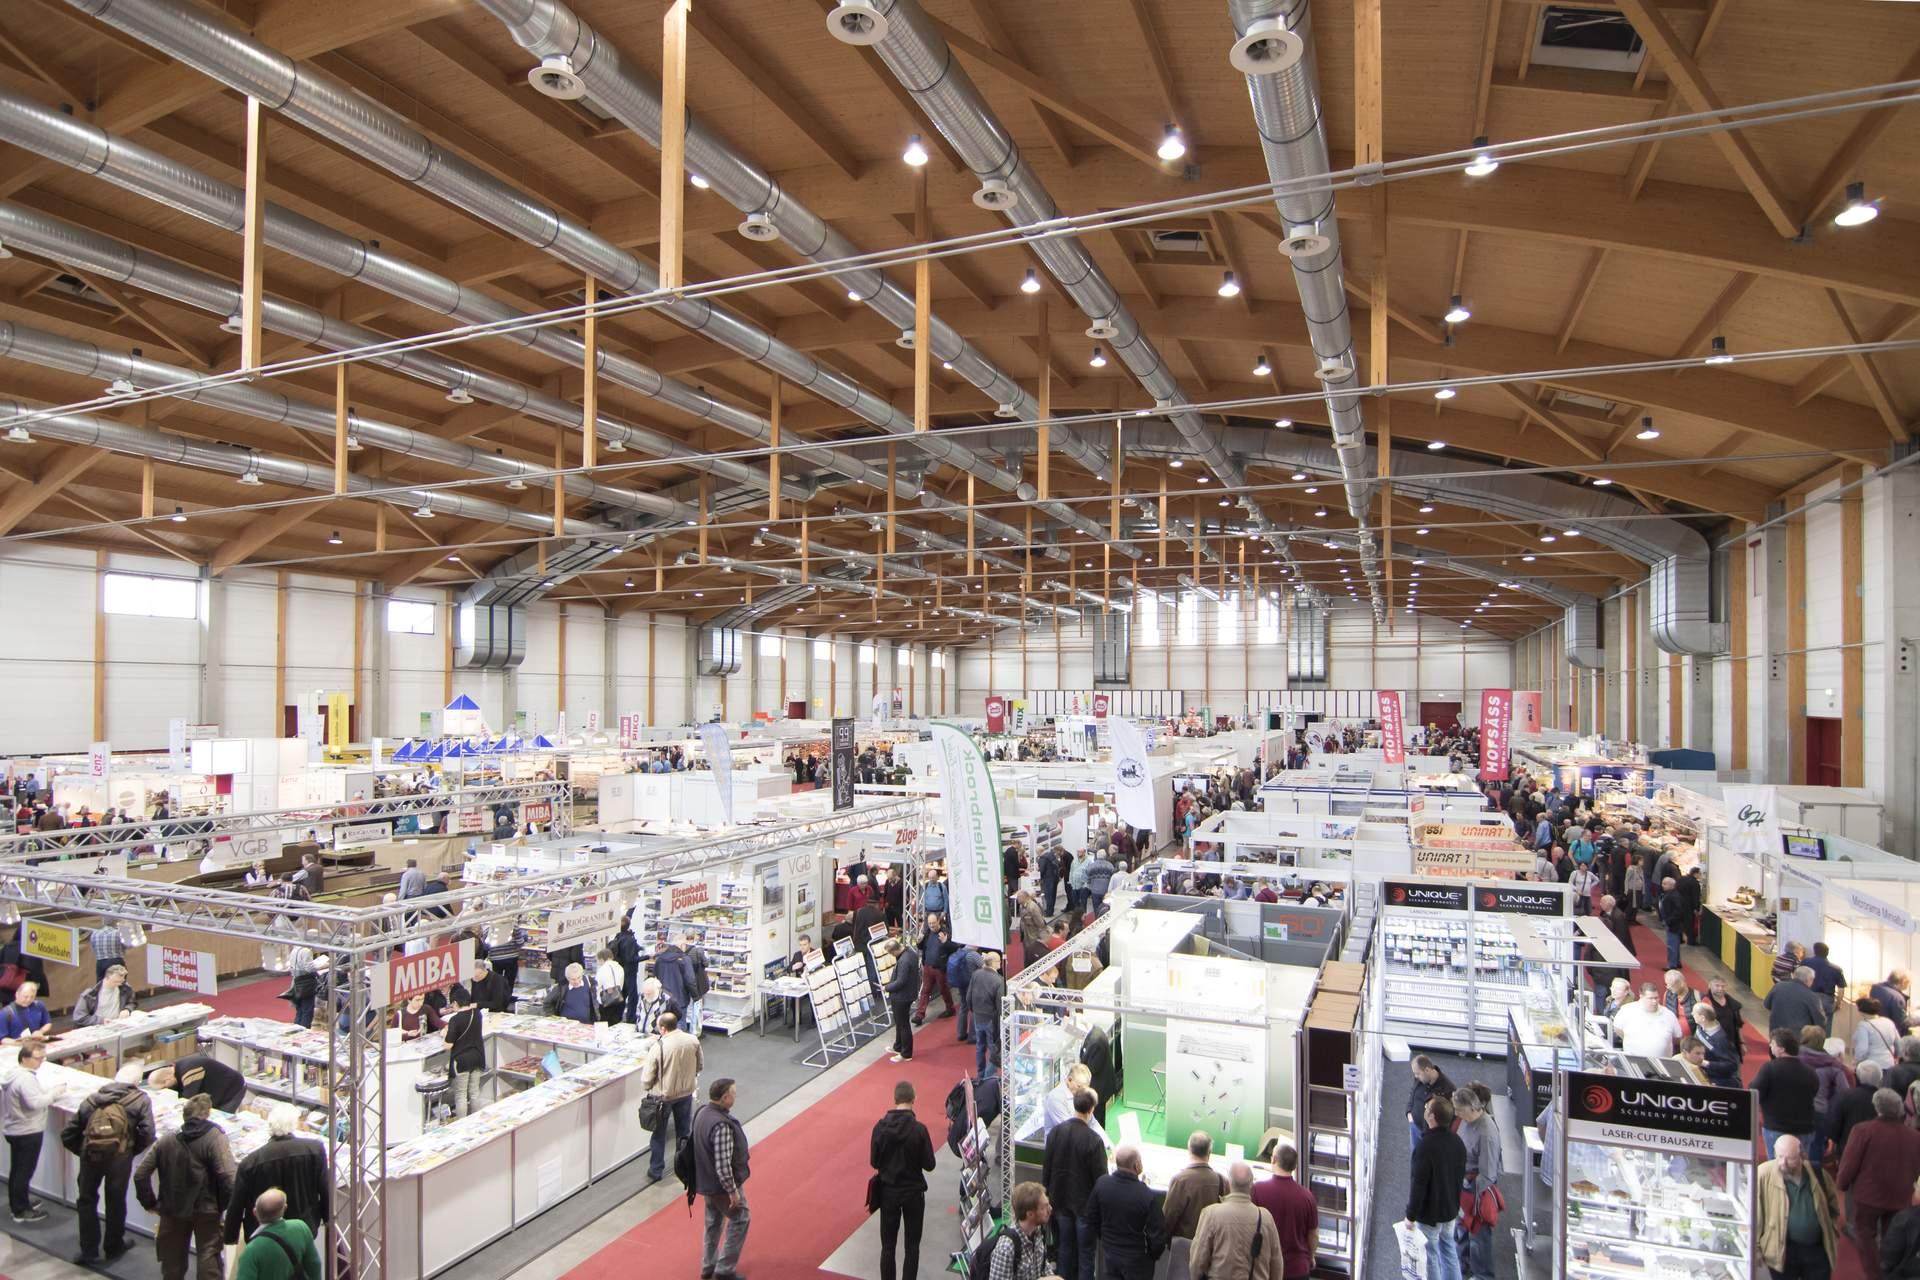 Modlebahnmesse Sinsheim